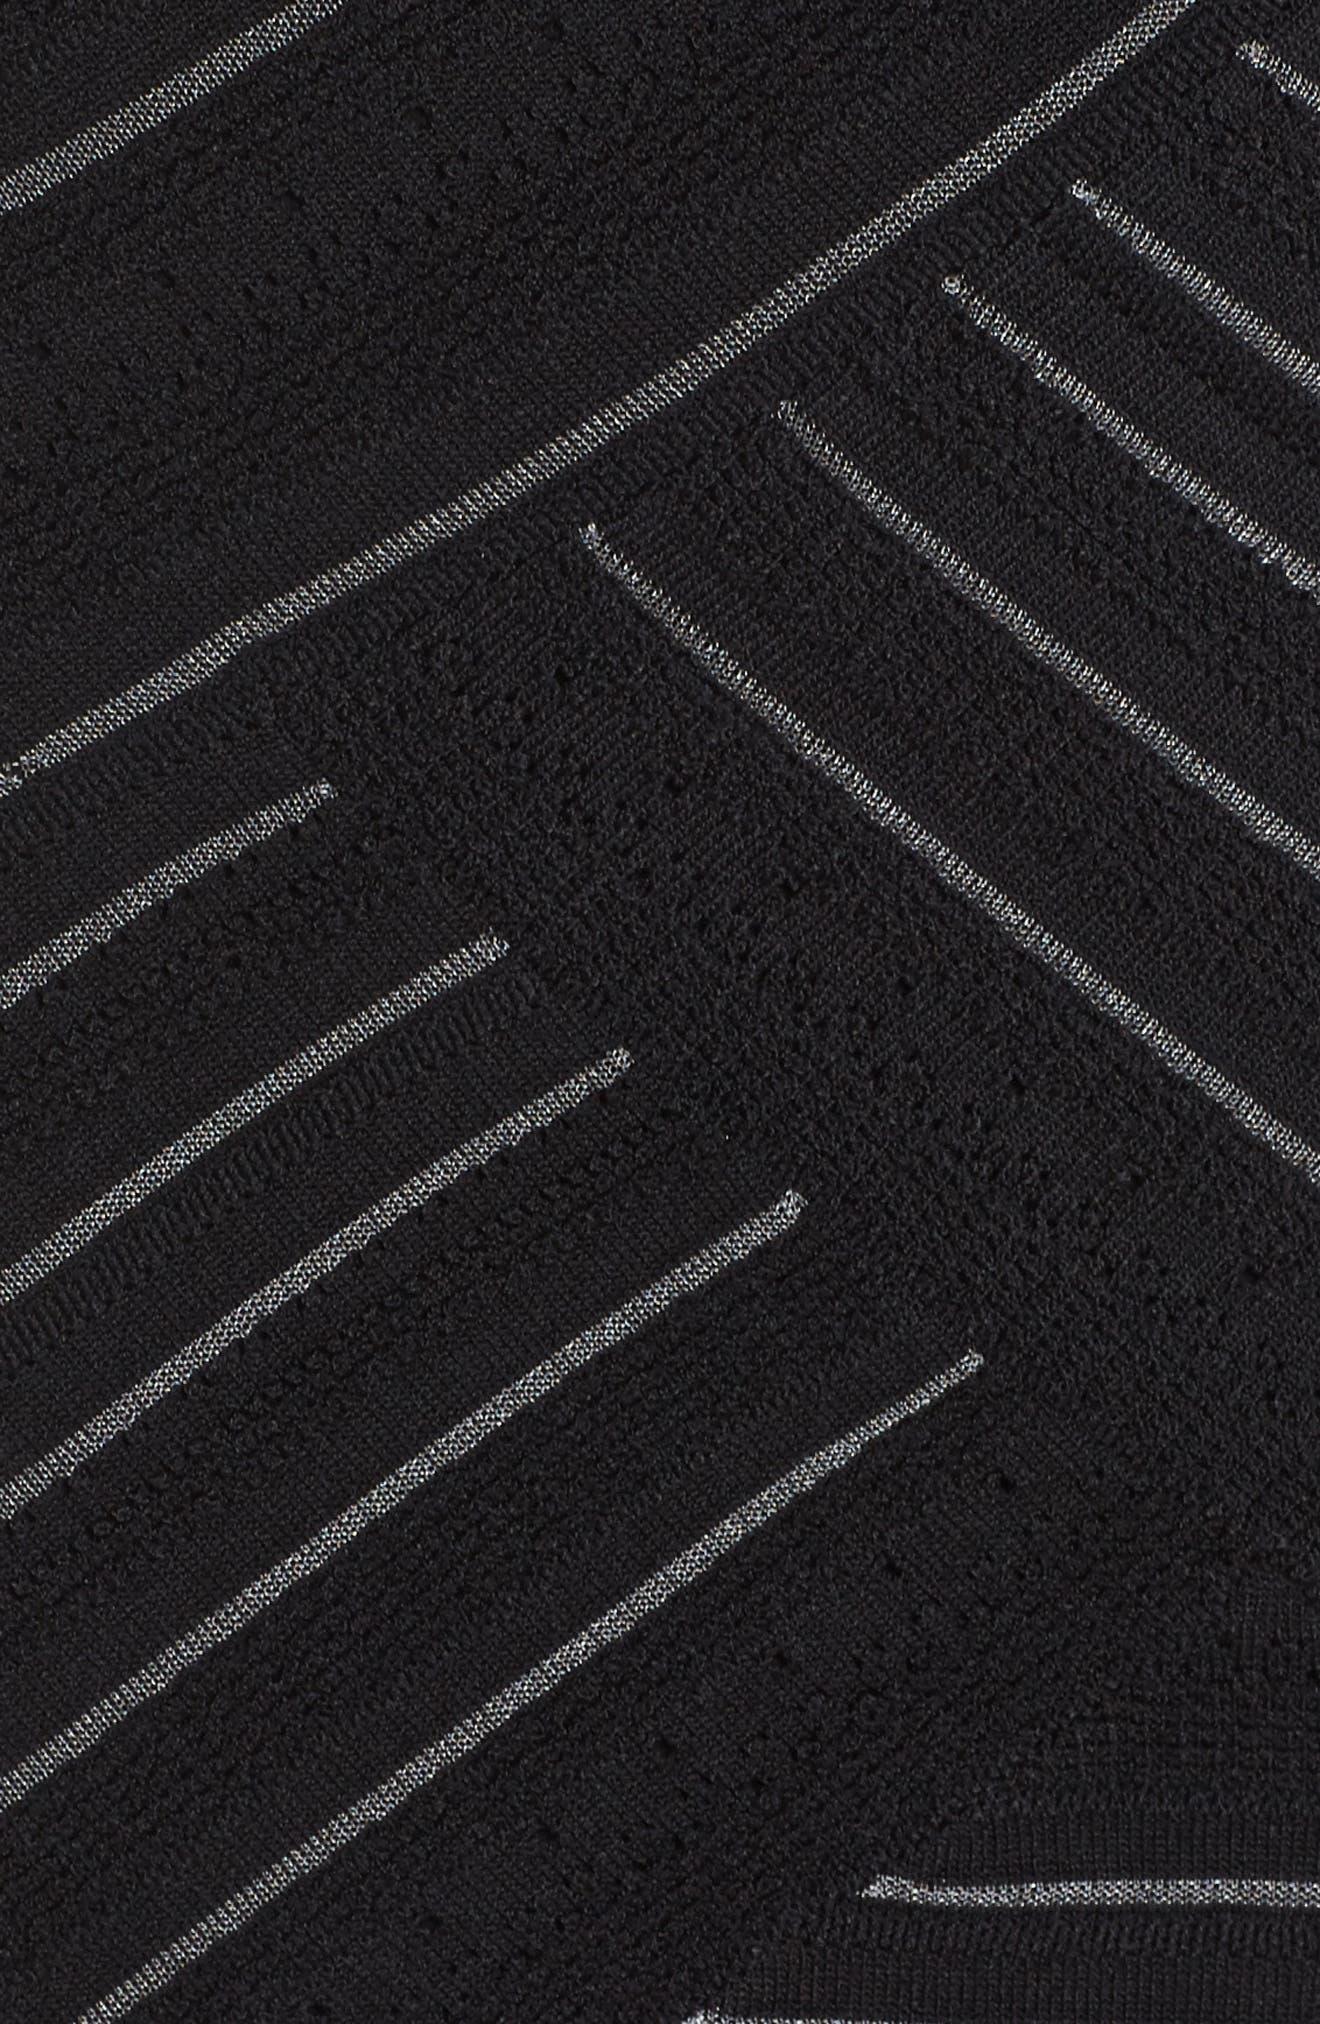 NIC+ ZOE Wrapped Up Sheath Dress,                             Alternate thumbnail 5, color,                             Black Onyx